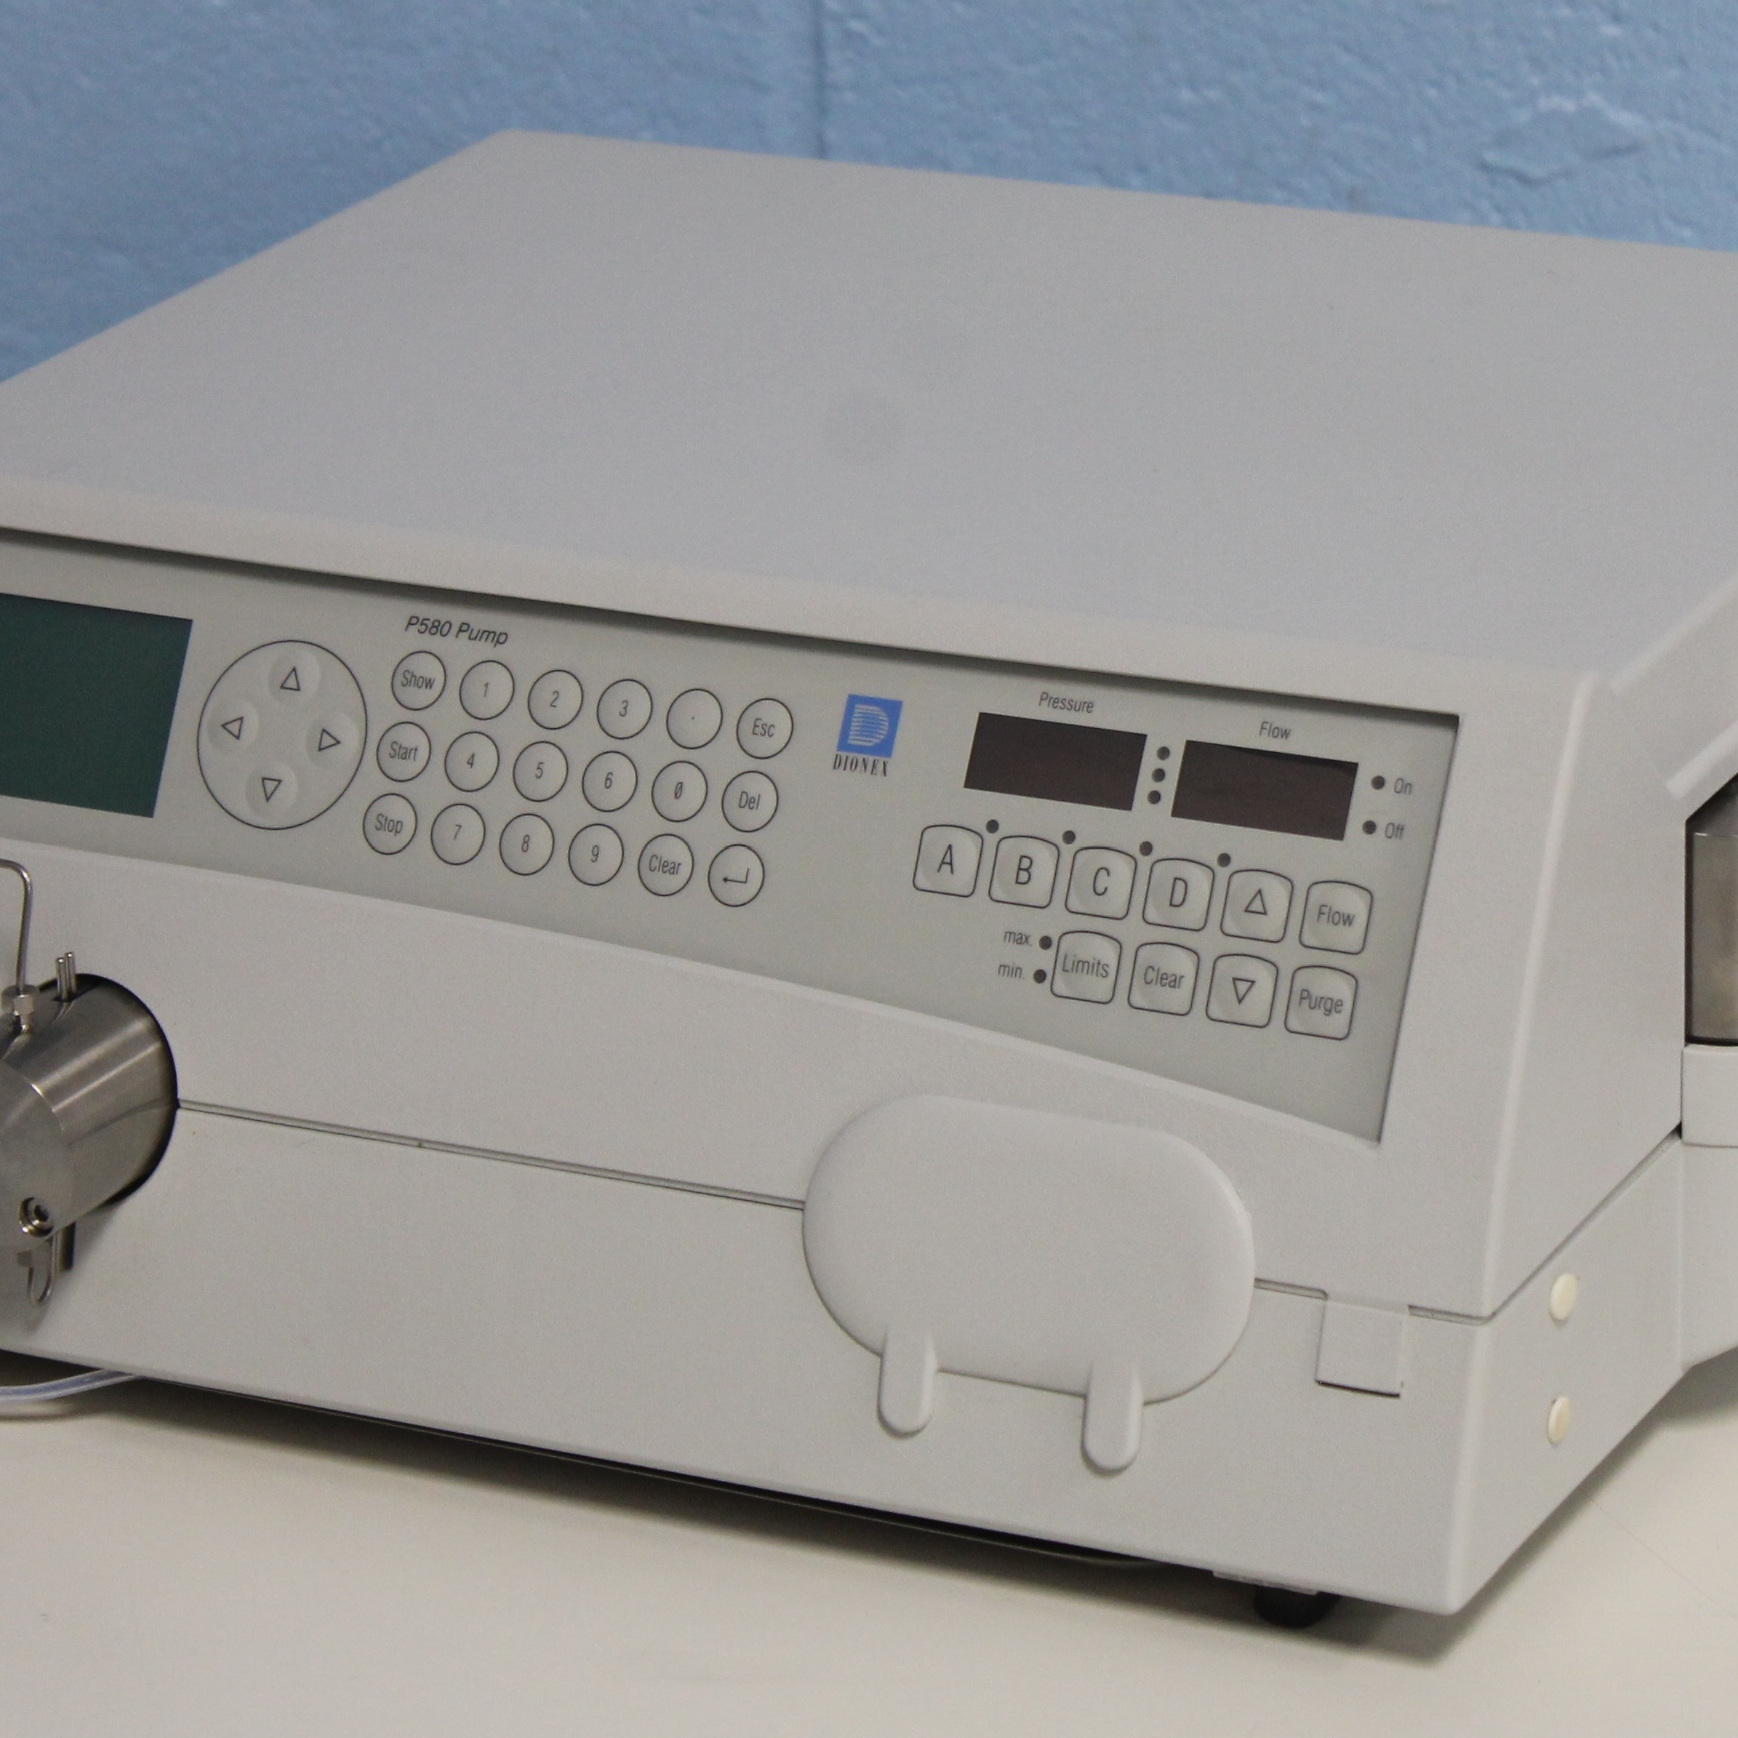 Dionex P580 Pump Image